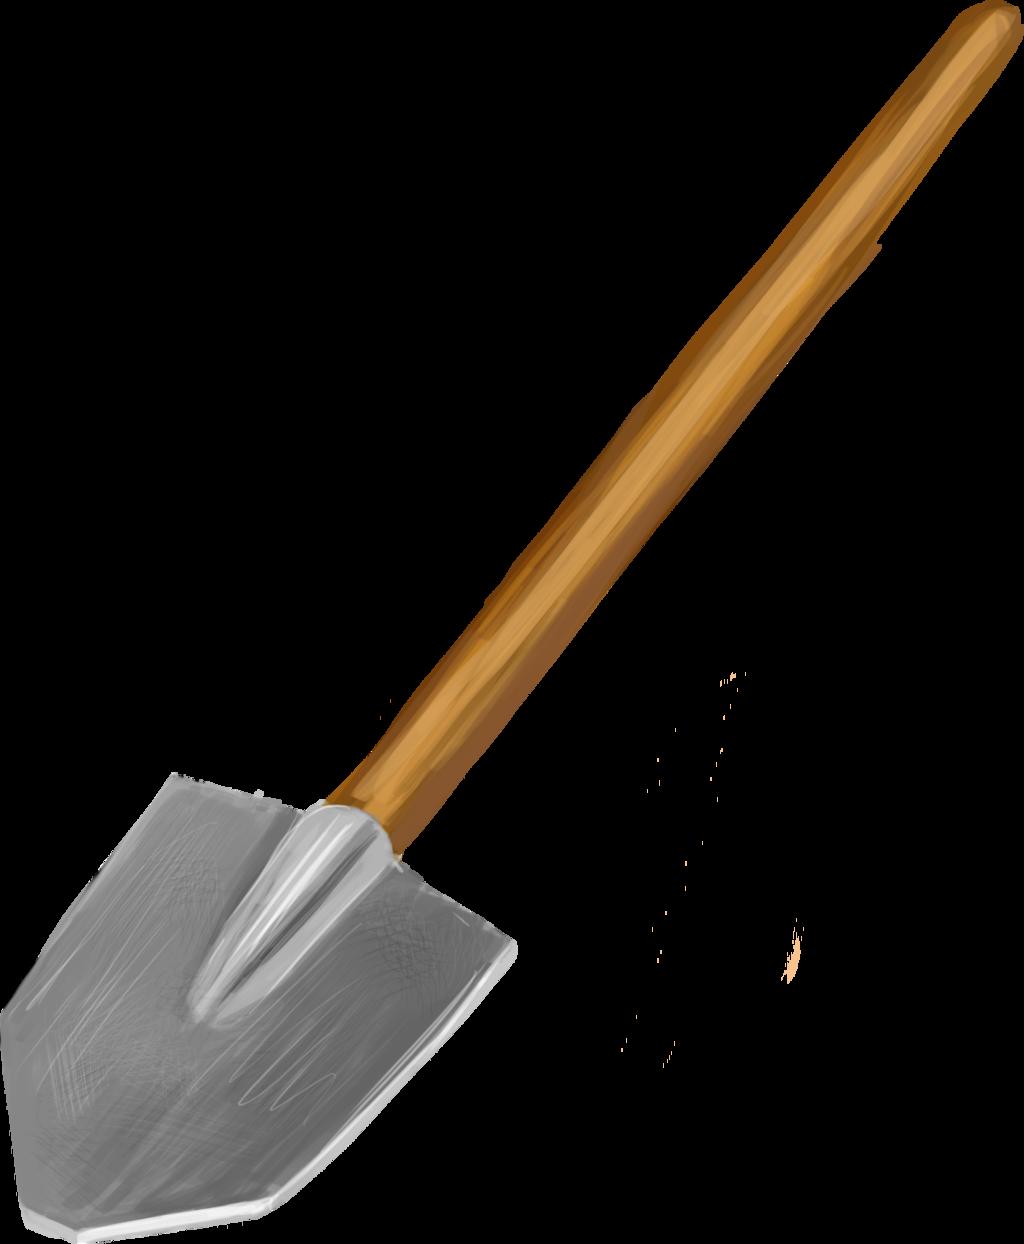 Shovel images free download clipart